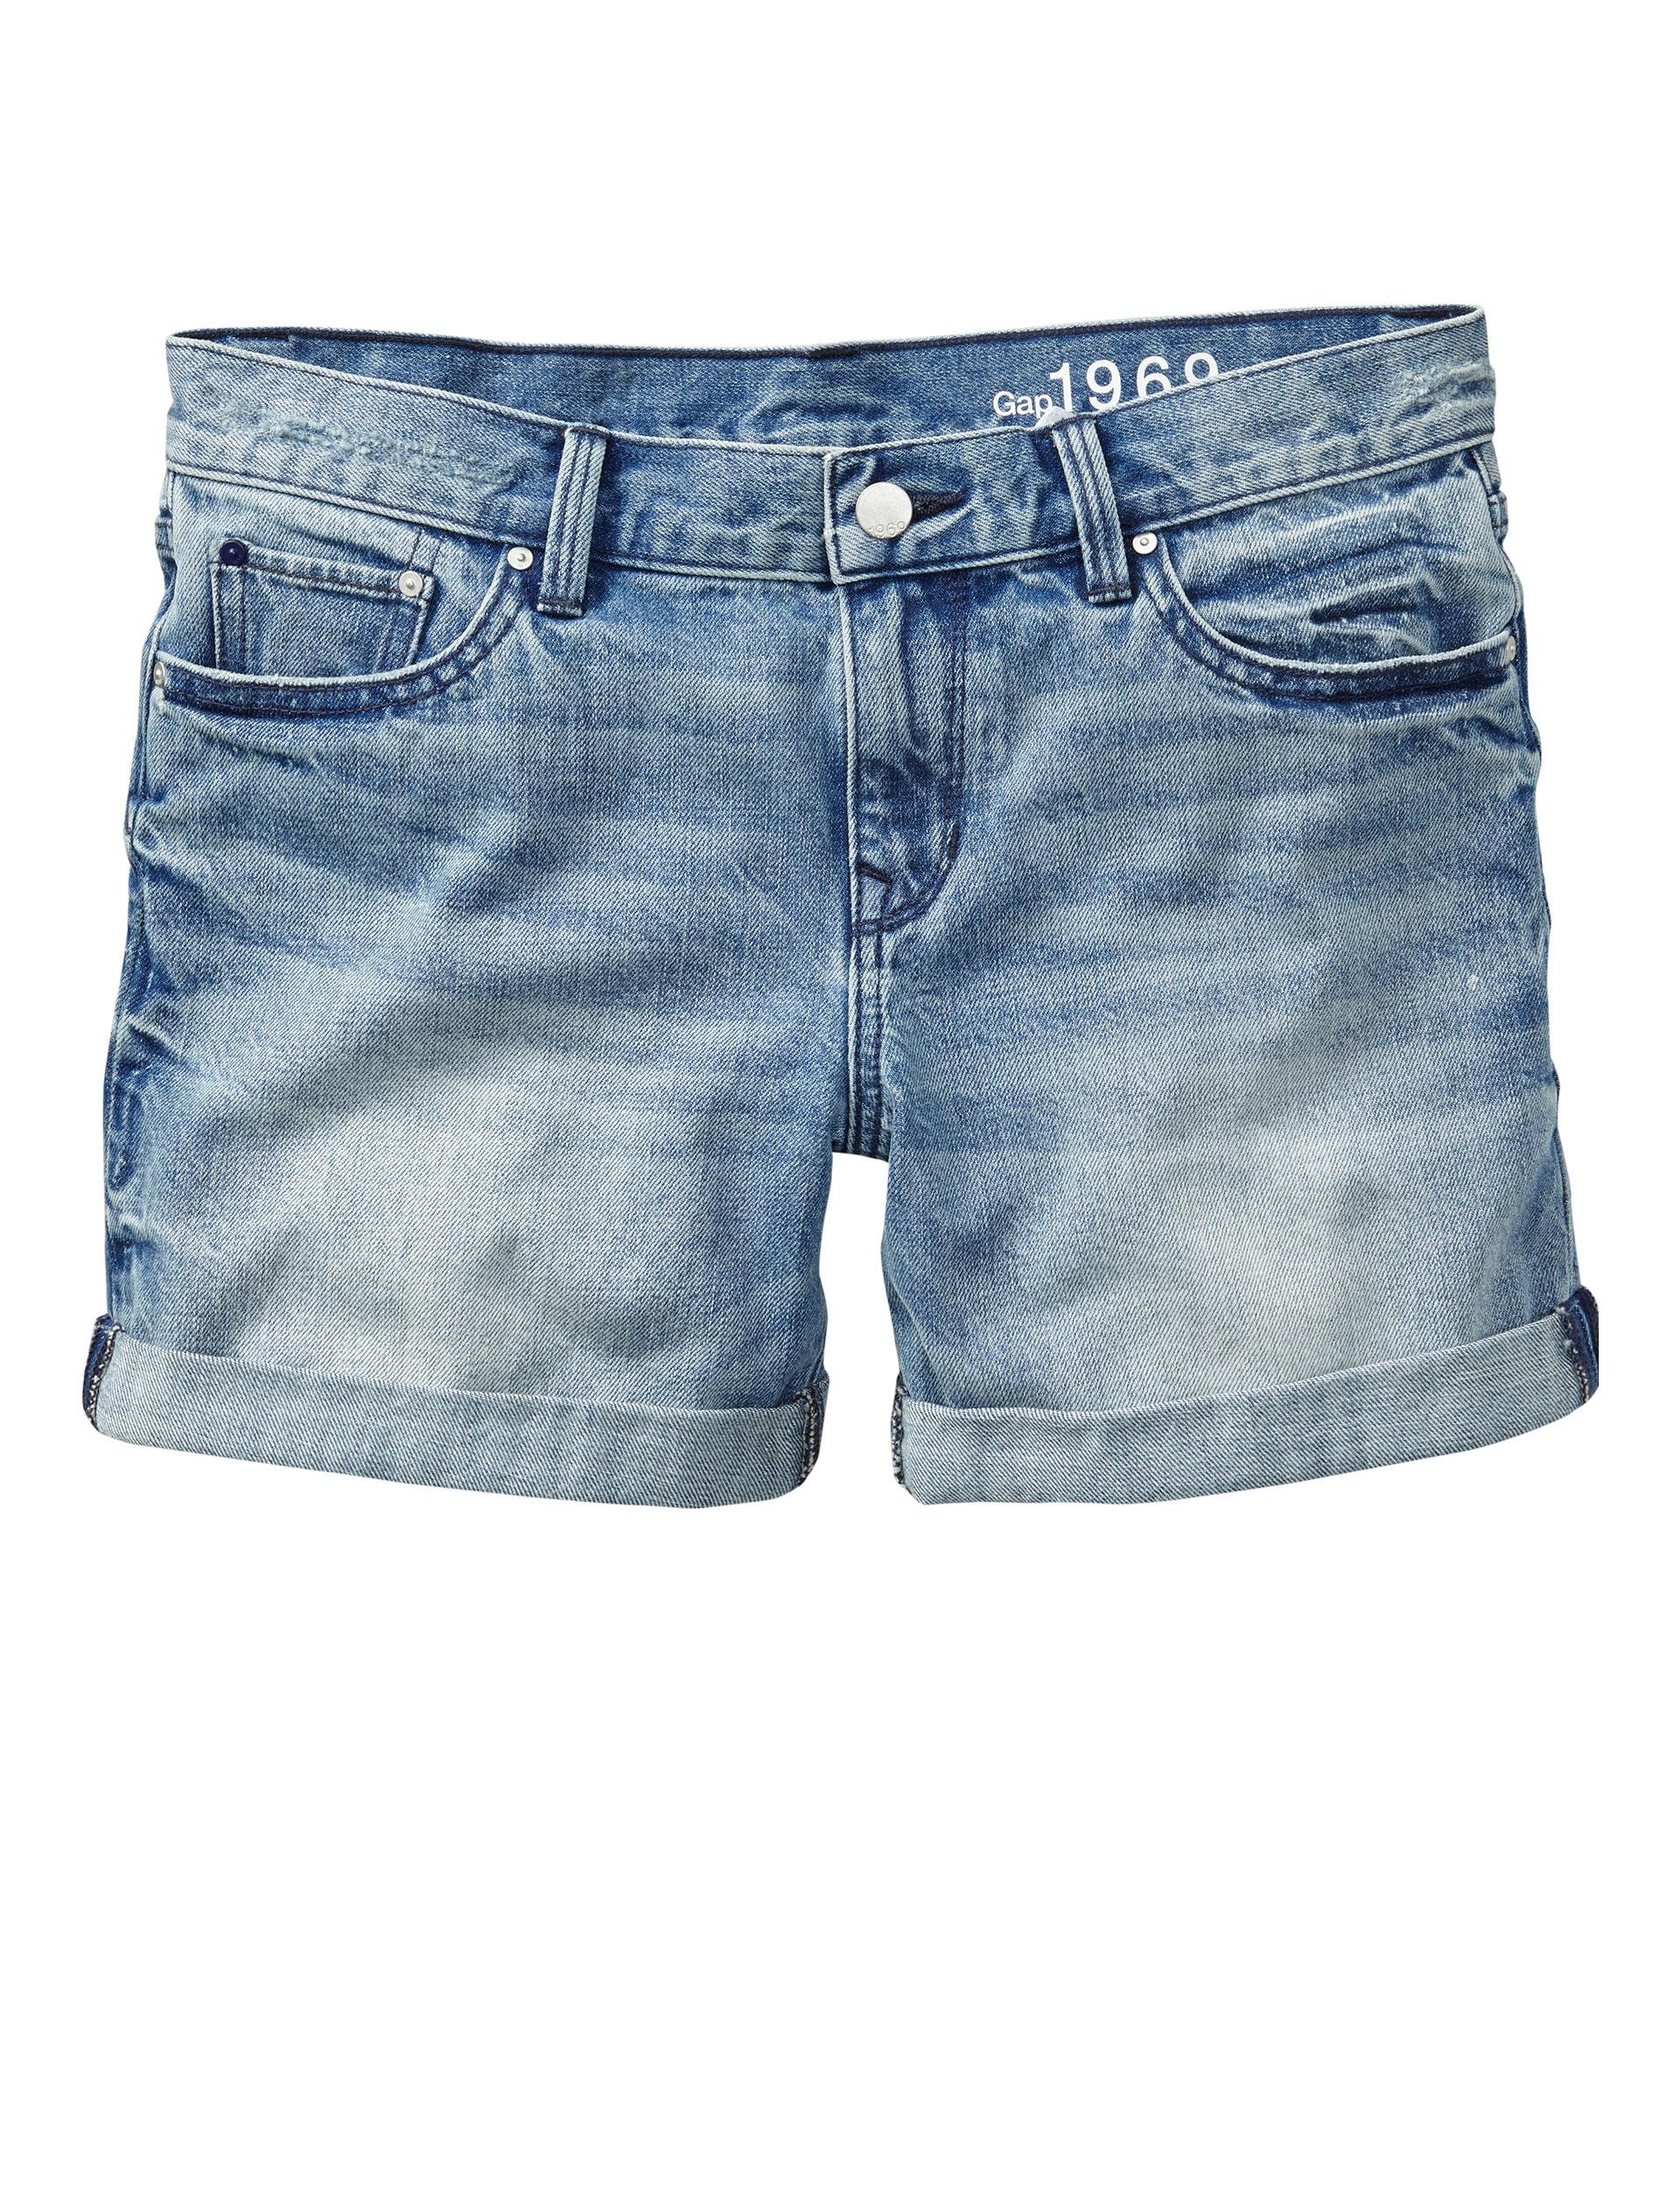 12 Best Jean Shorts